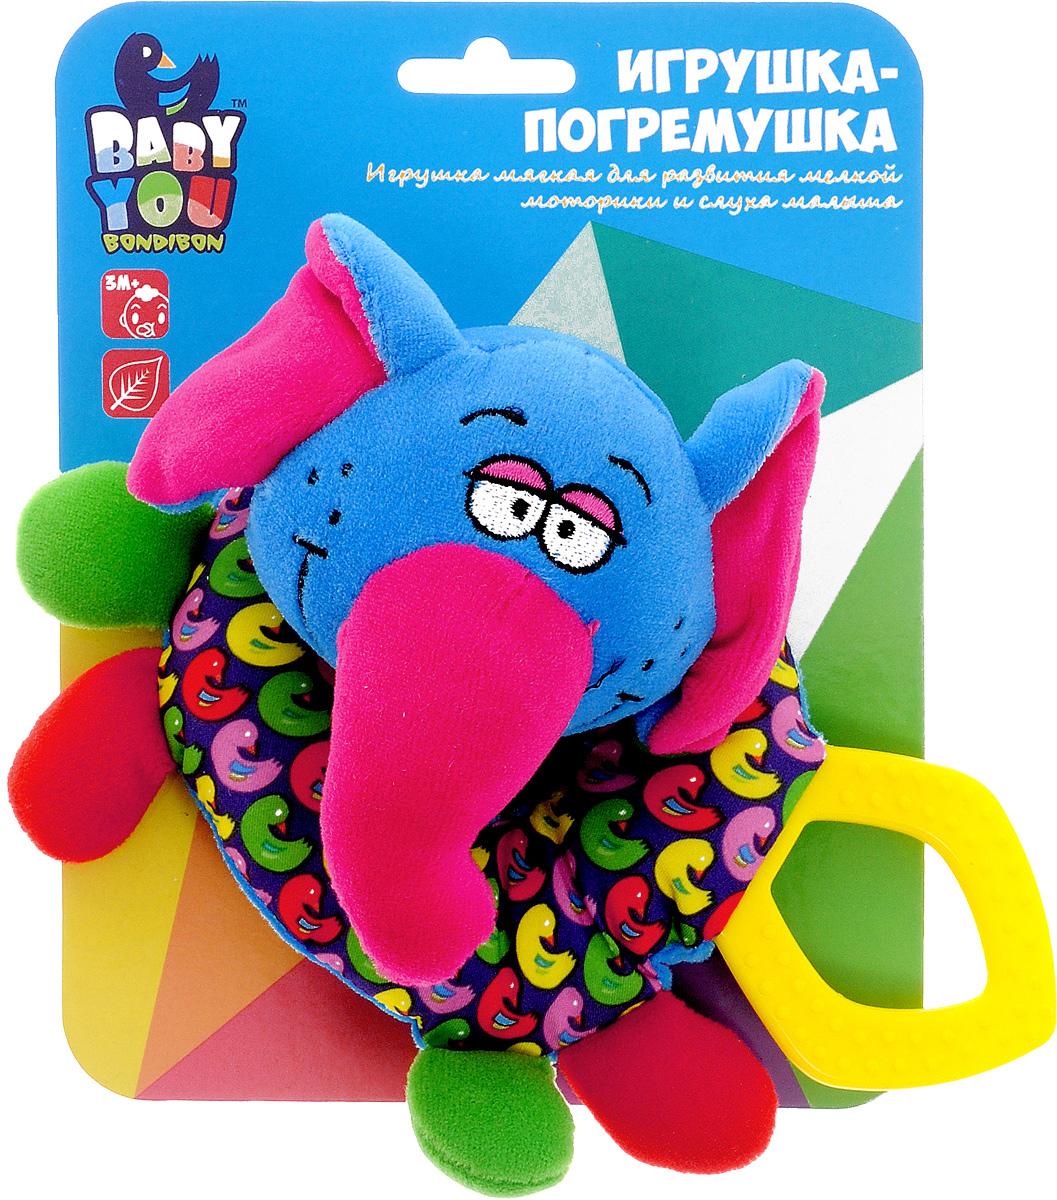 Bondibon Мягкая игрушка-погремушка Слоник bondibon мягкая игрушка погремушка слоник